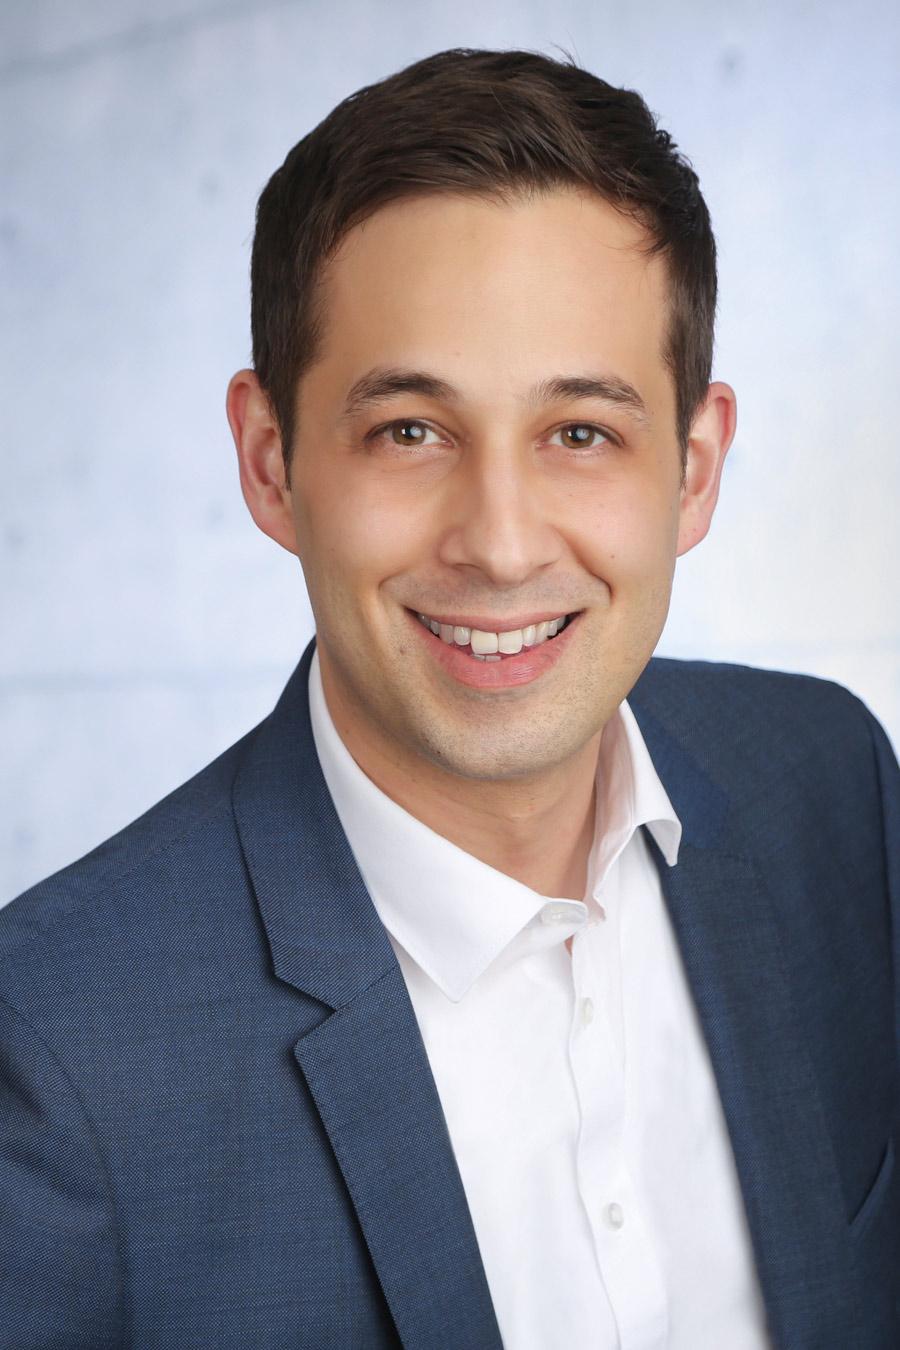 Daniel Schäfer